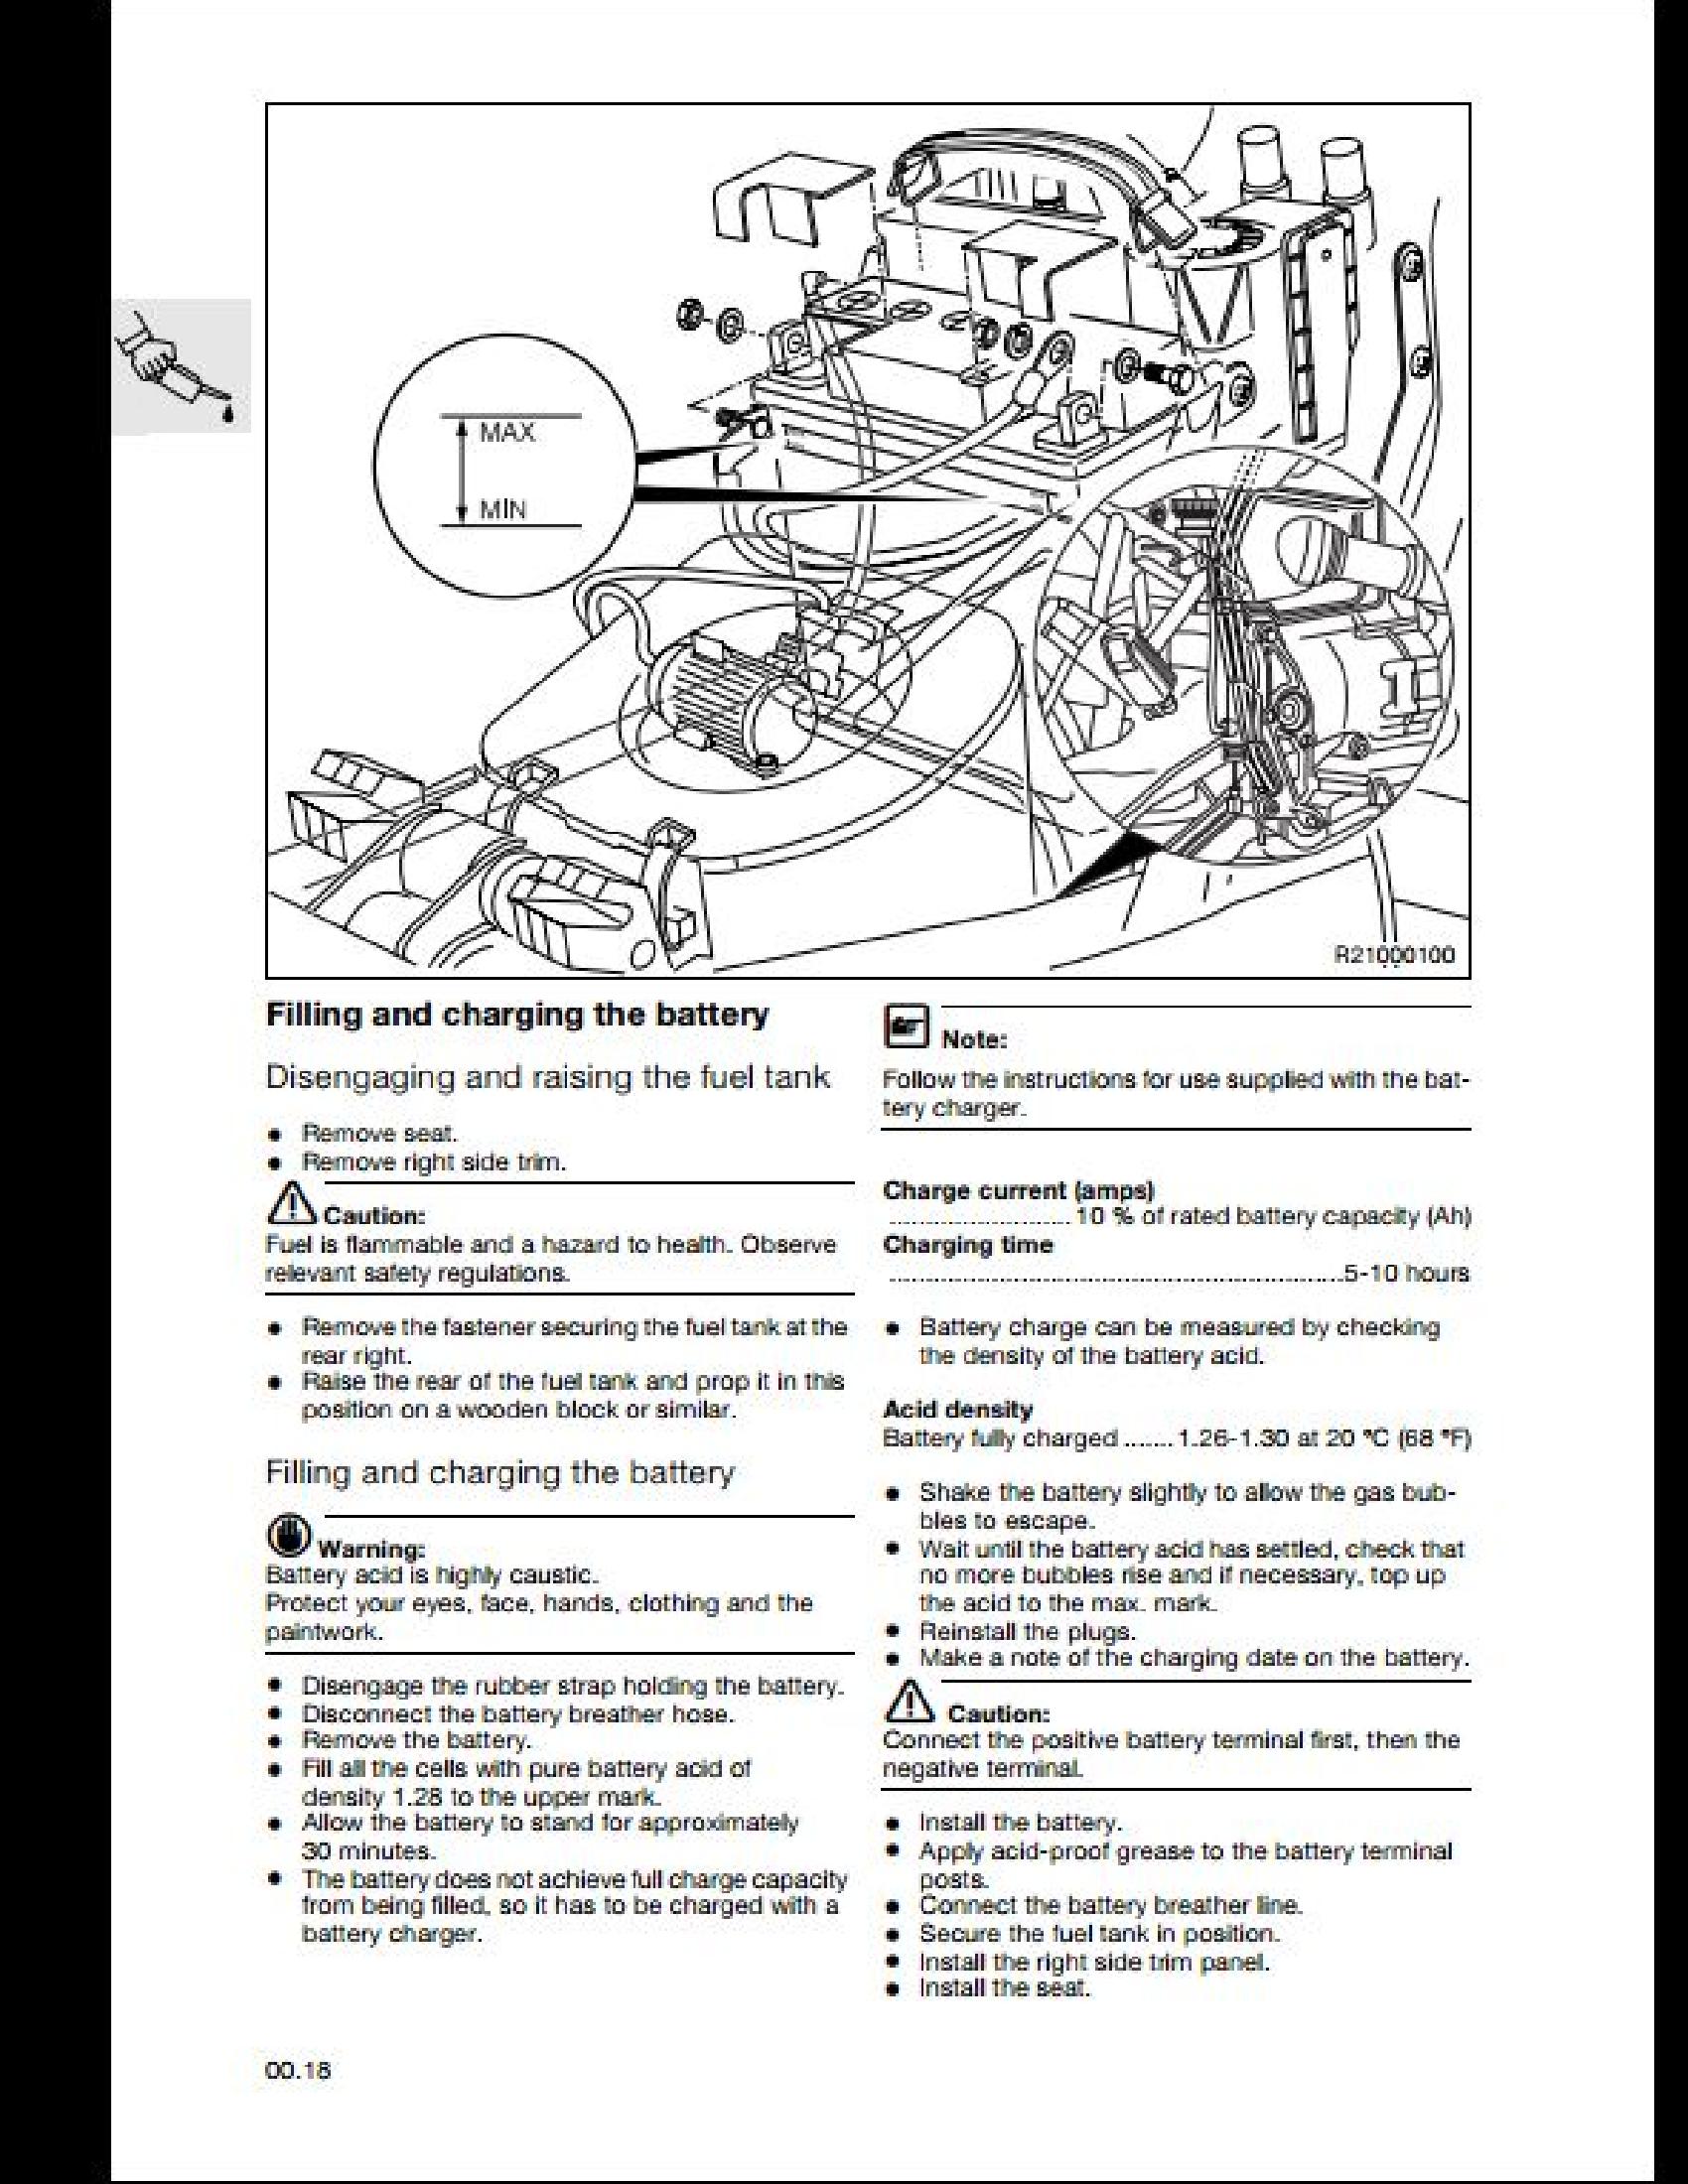 BMW R1150GS Motorcycle manual